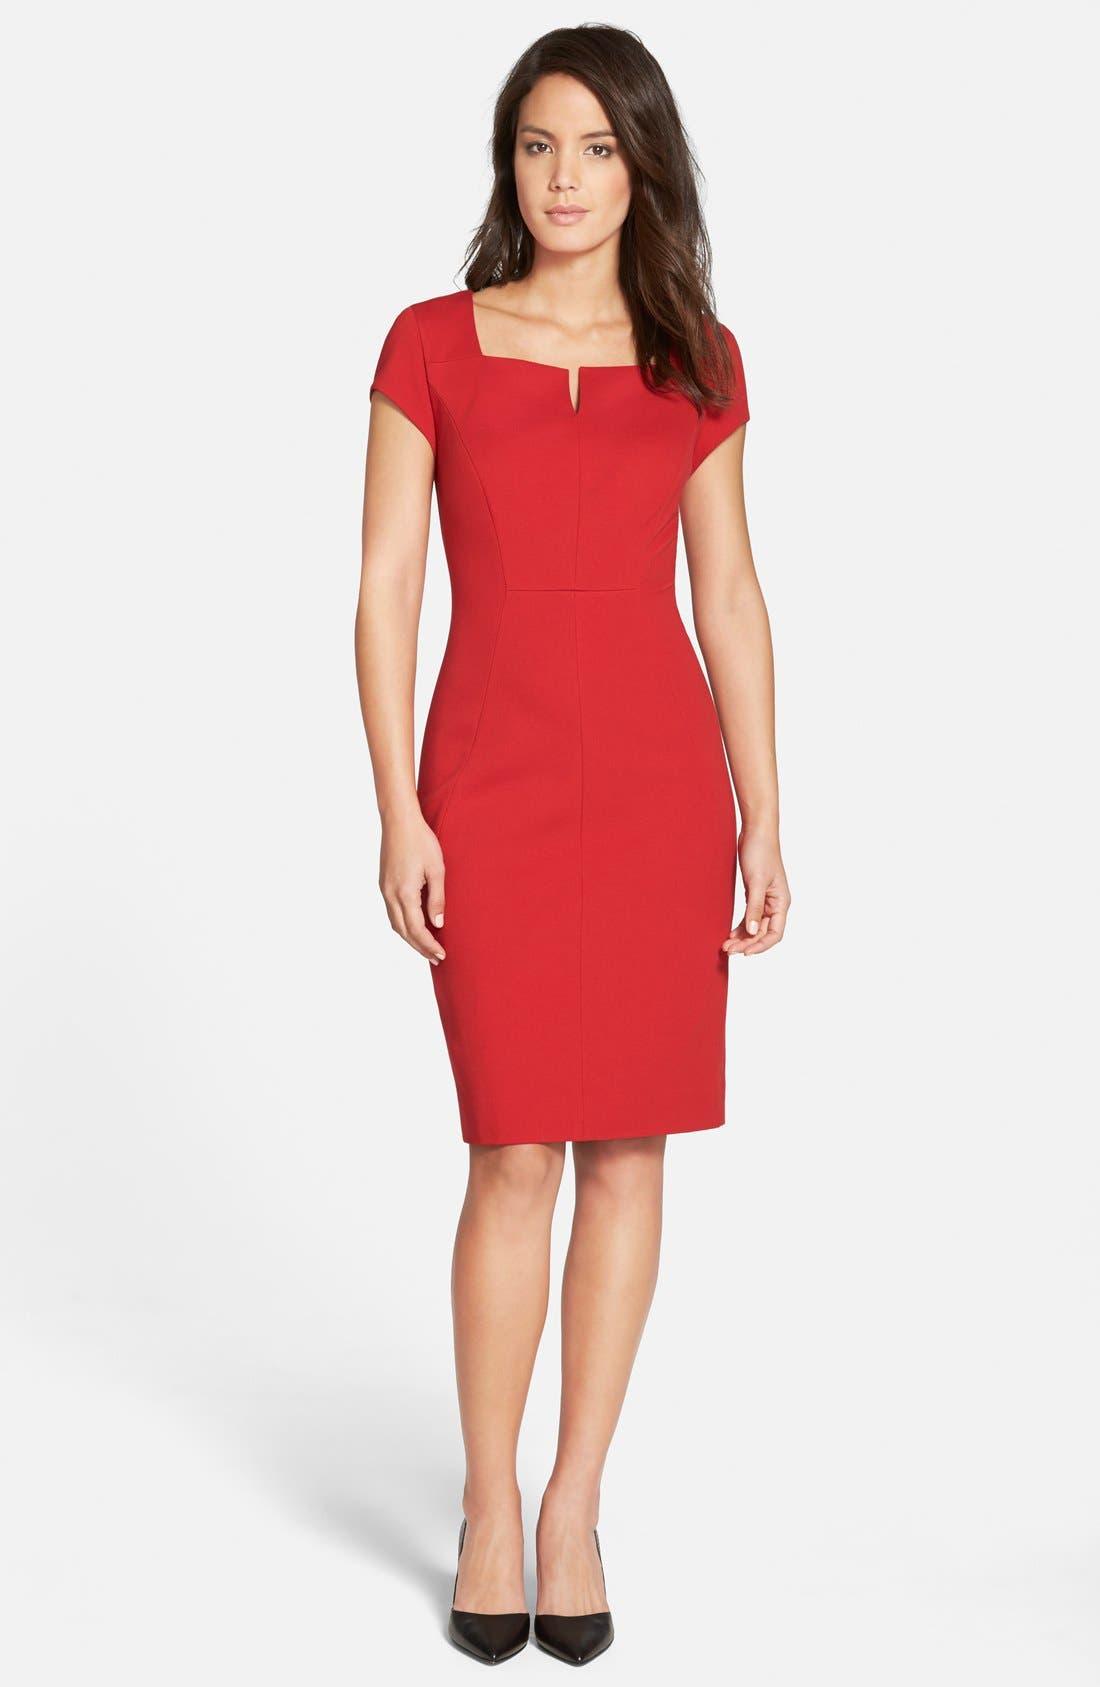 Alternate Image 1 Selected - Classiques Entier® Notched Square Neck Ponte Sheath Dress